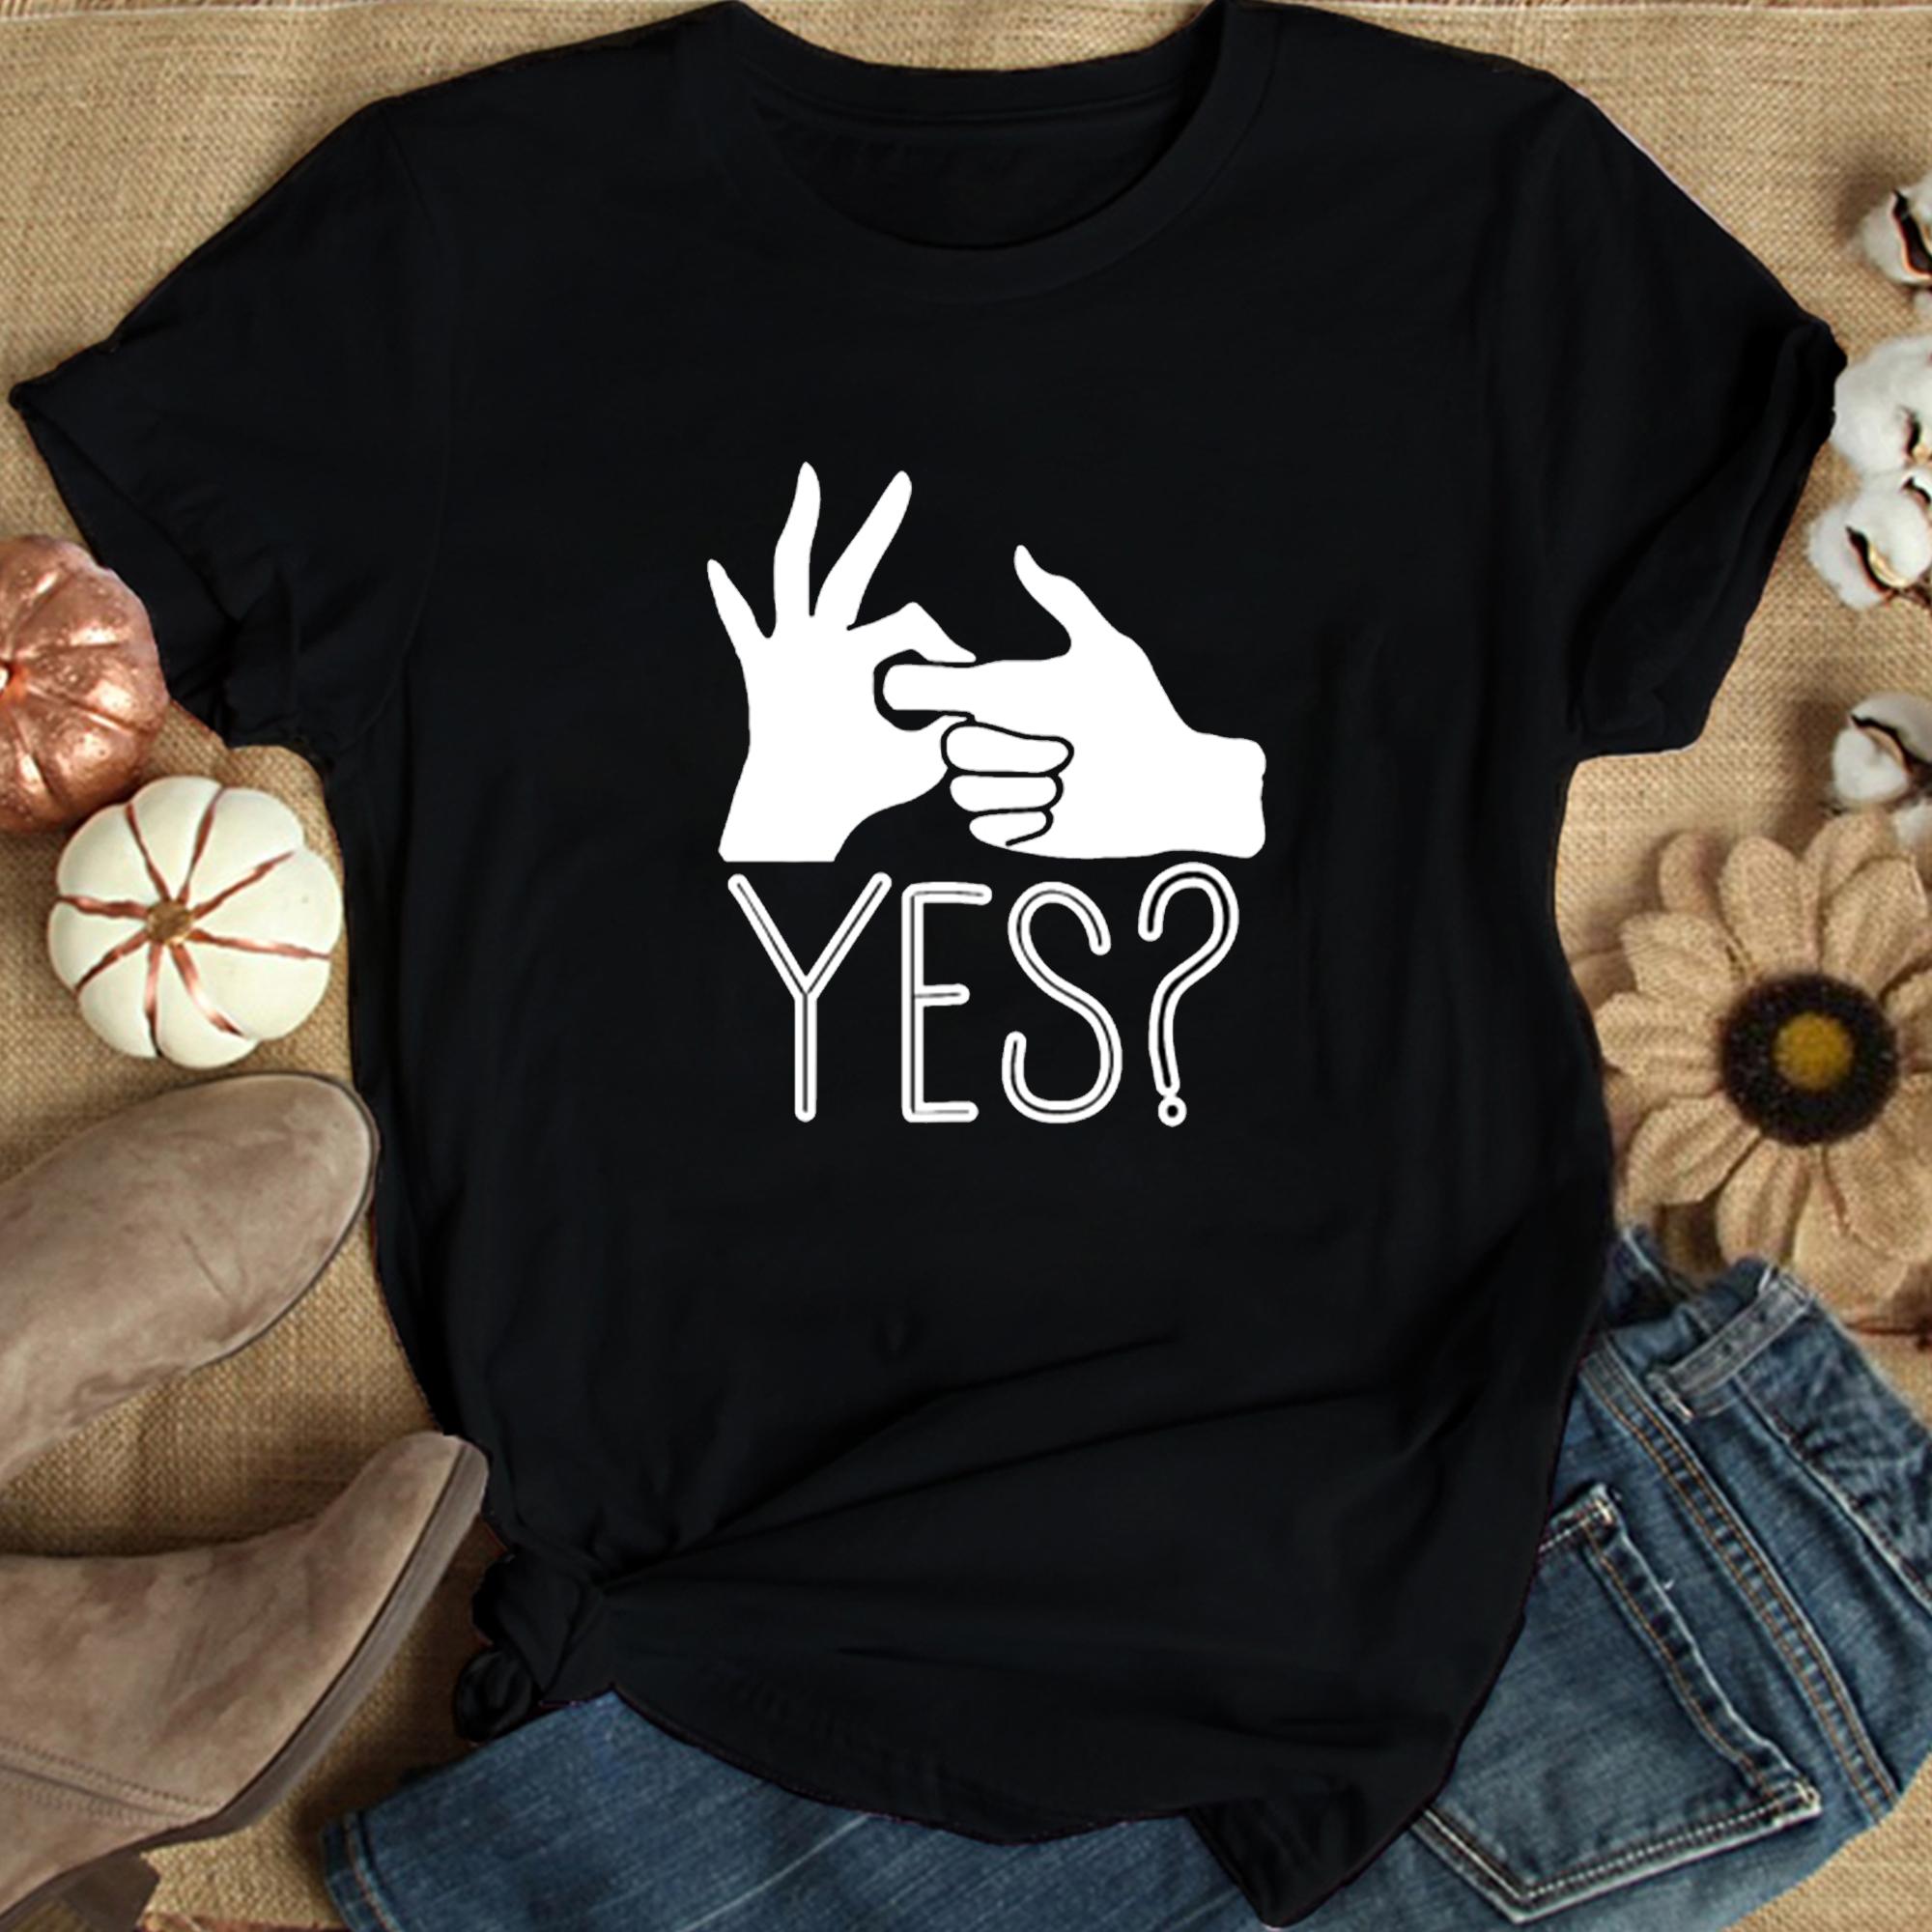 Obscene Lover Shirt YES Hand Gesture Sex